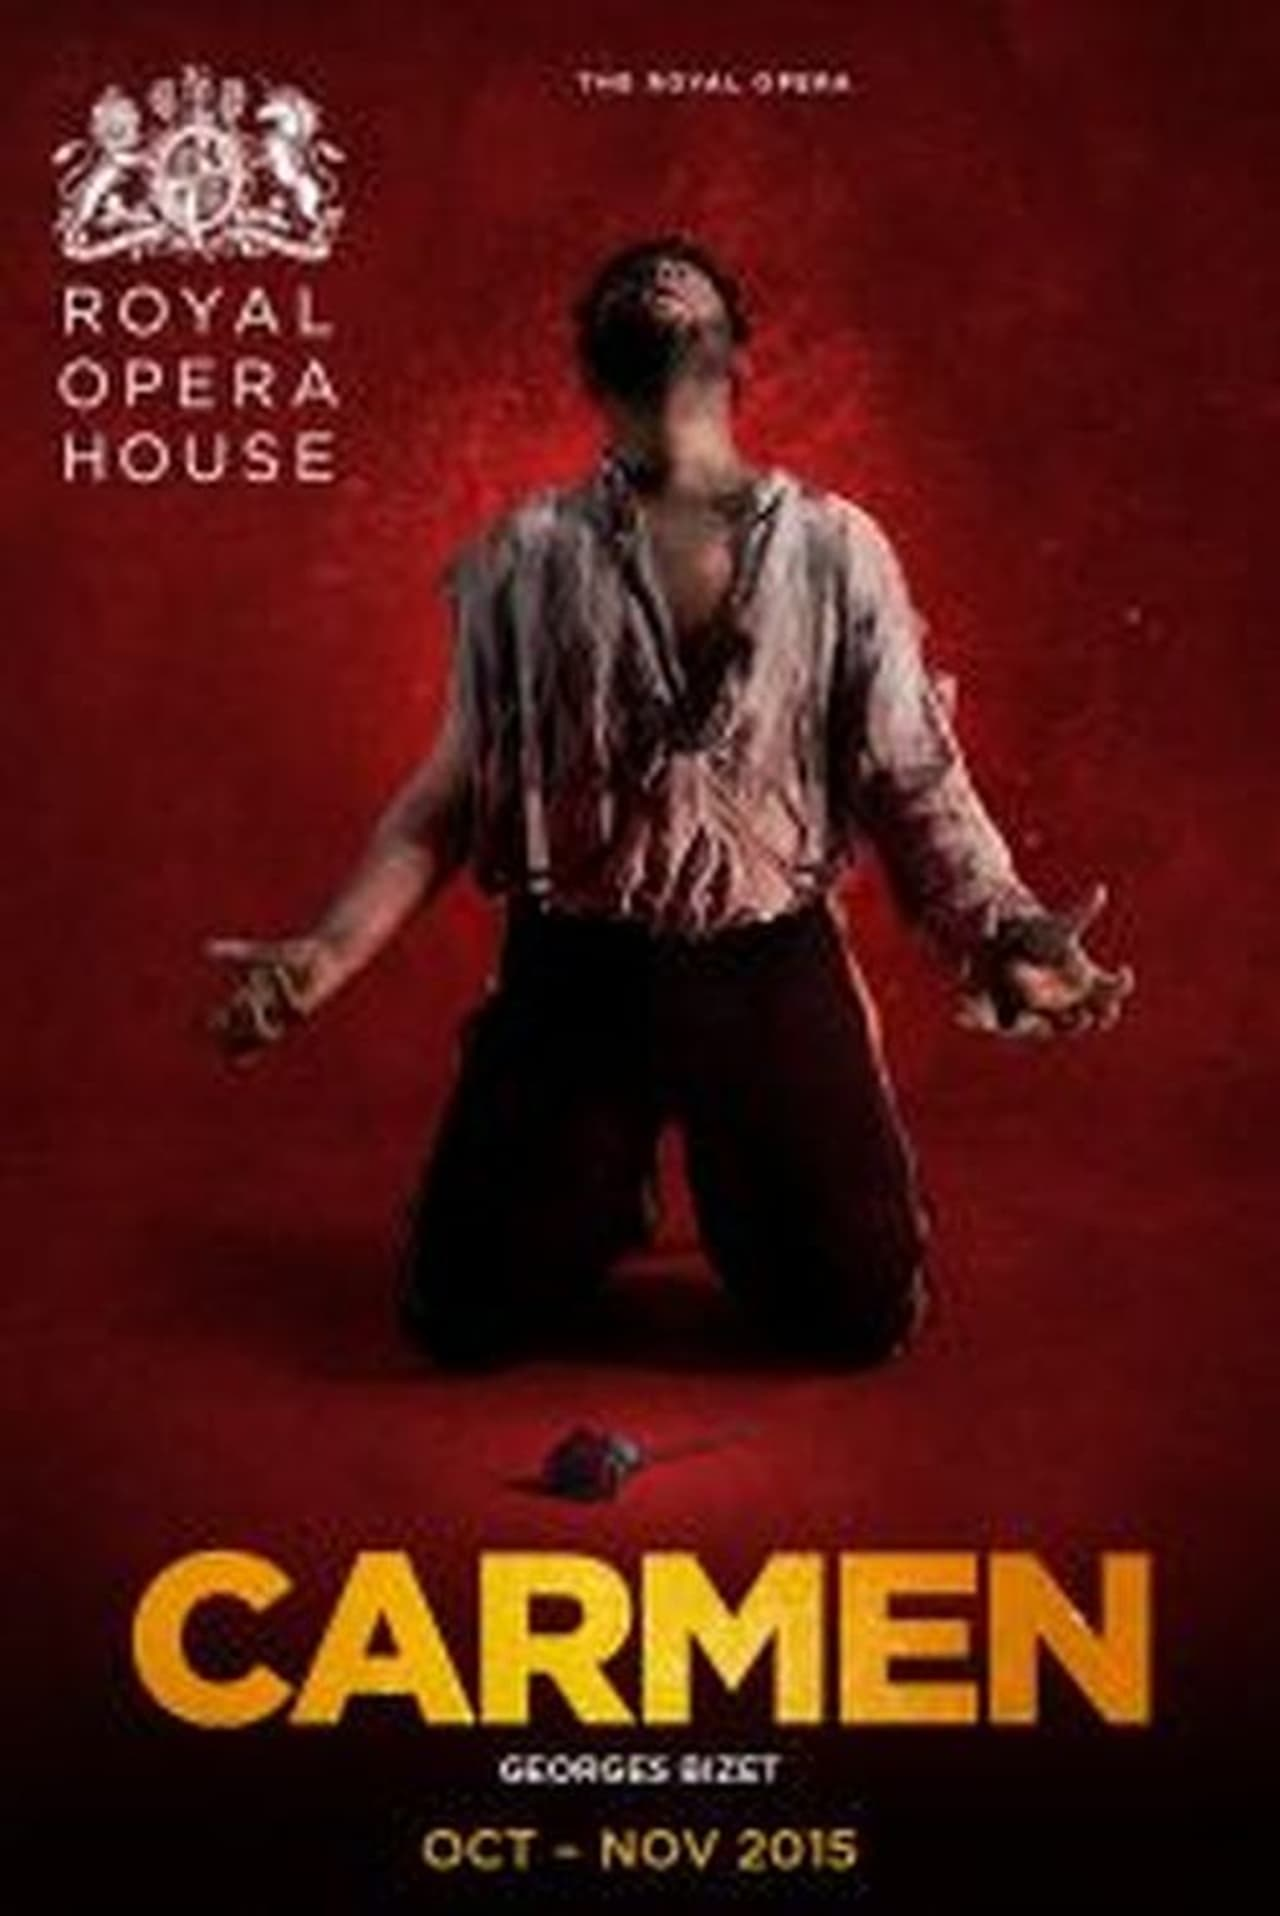 The ROH Live: Carmen